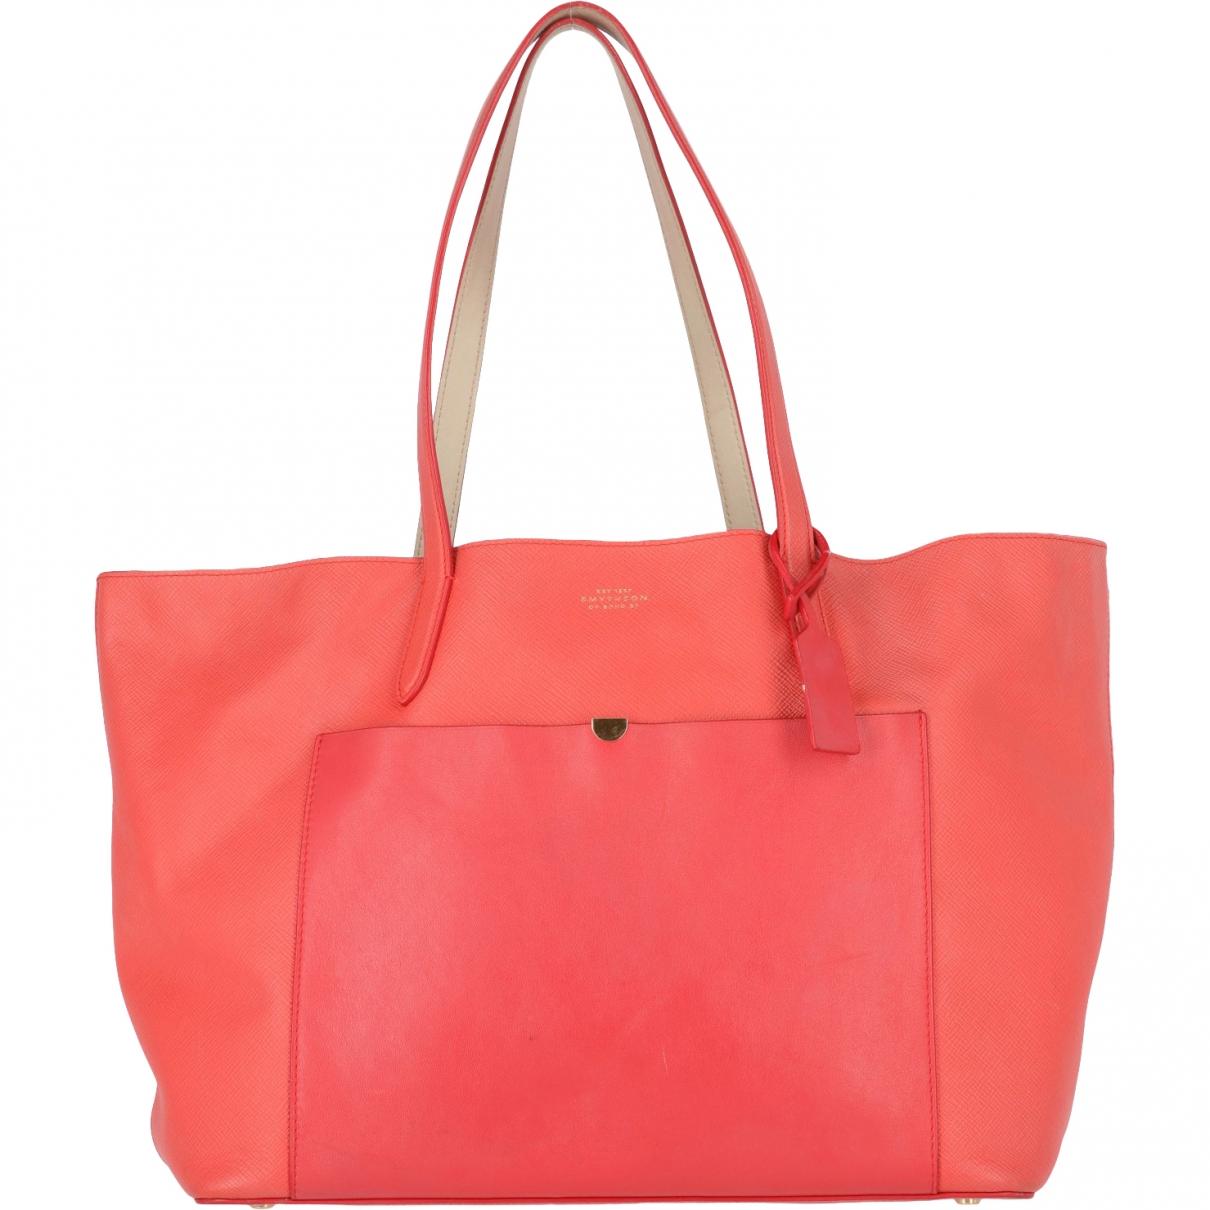 Smythson \N Red Leather handbag for Women \N